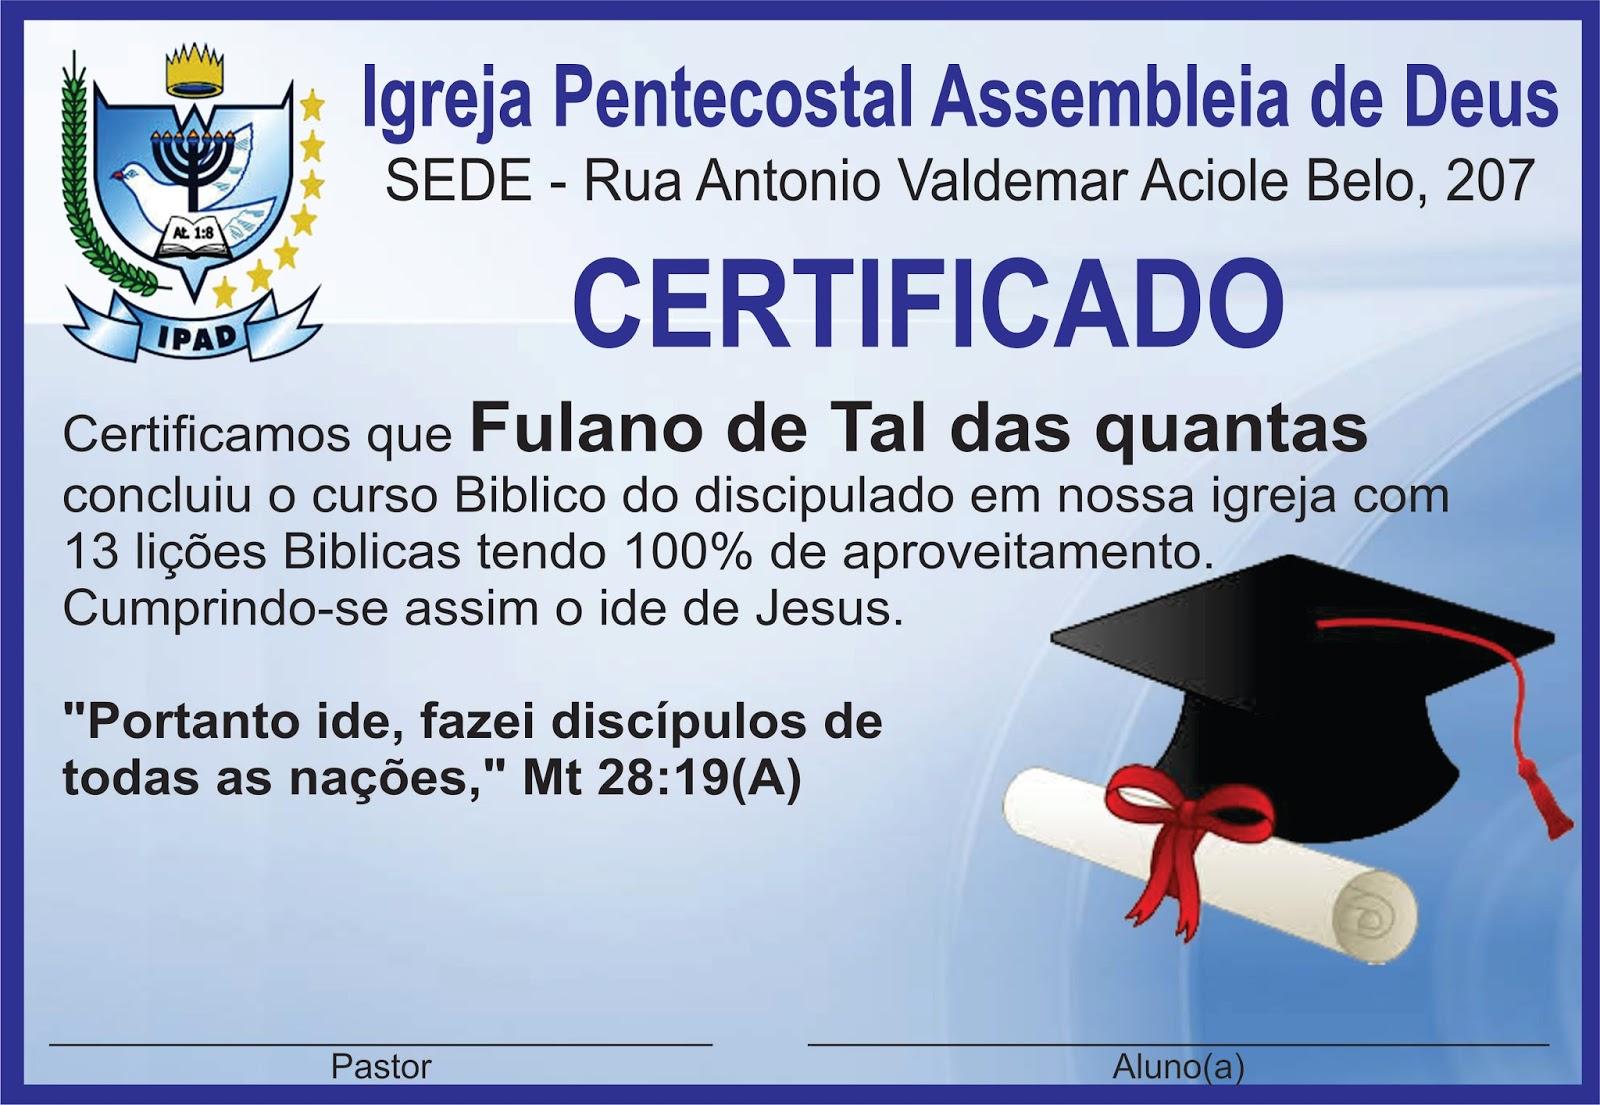 Certificado%2Bde%2BDiscipulado%2BIgreja%2BEvang%25C3%25A9lica.jpg